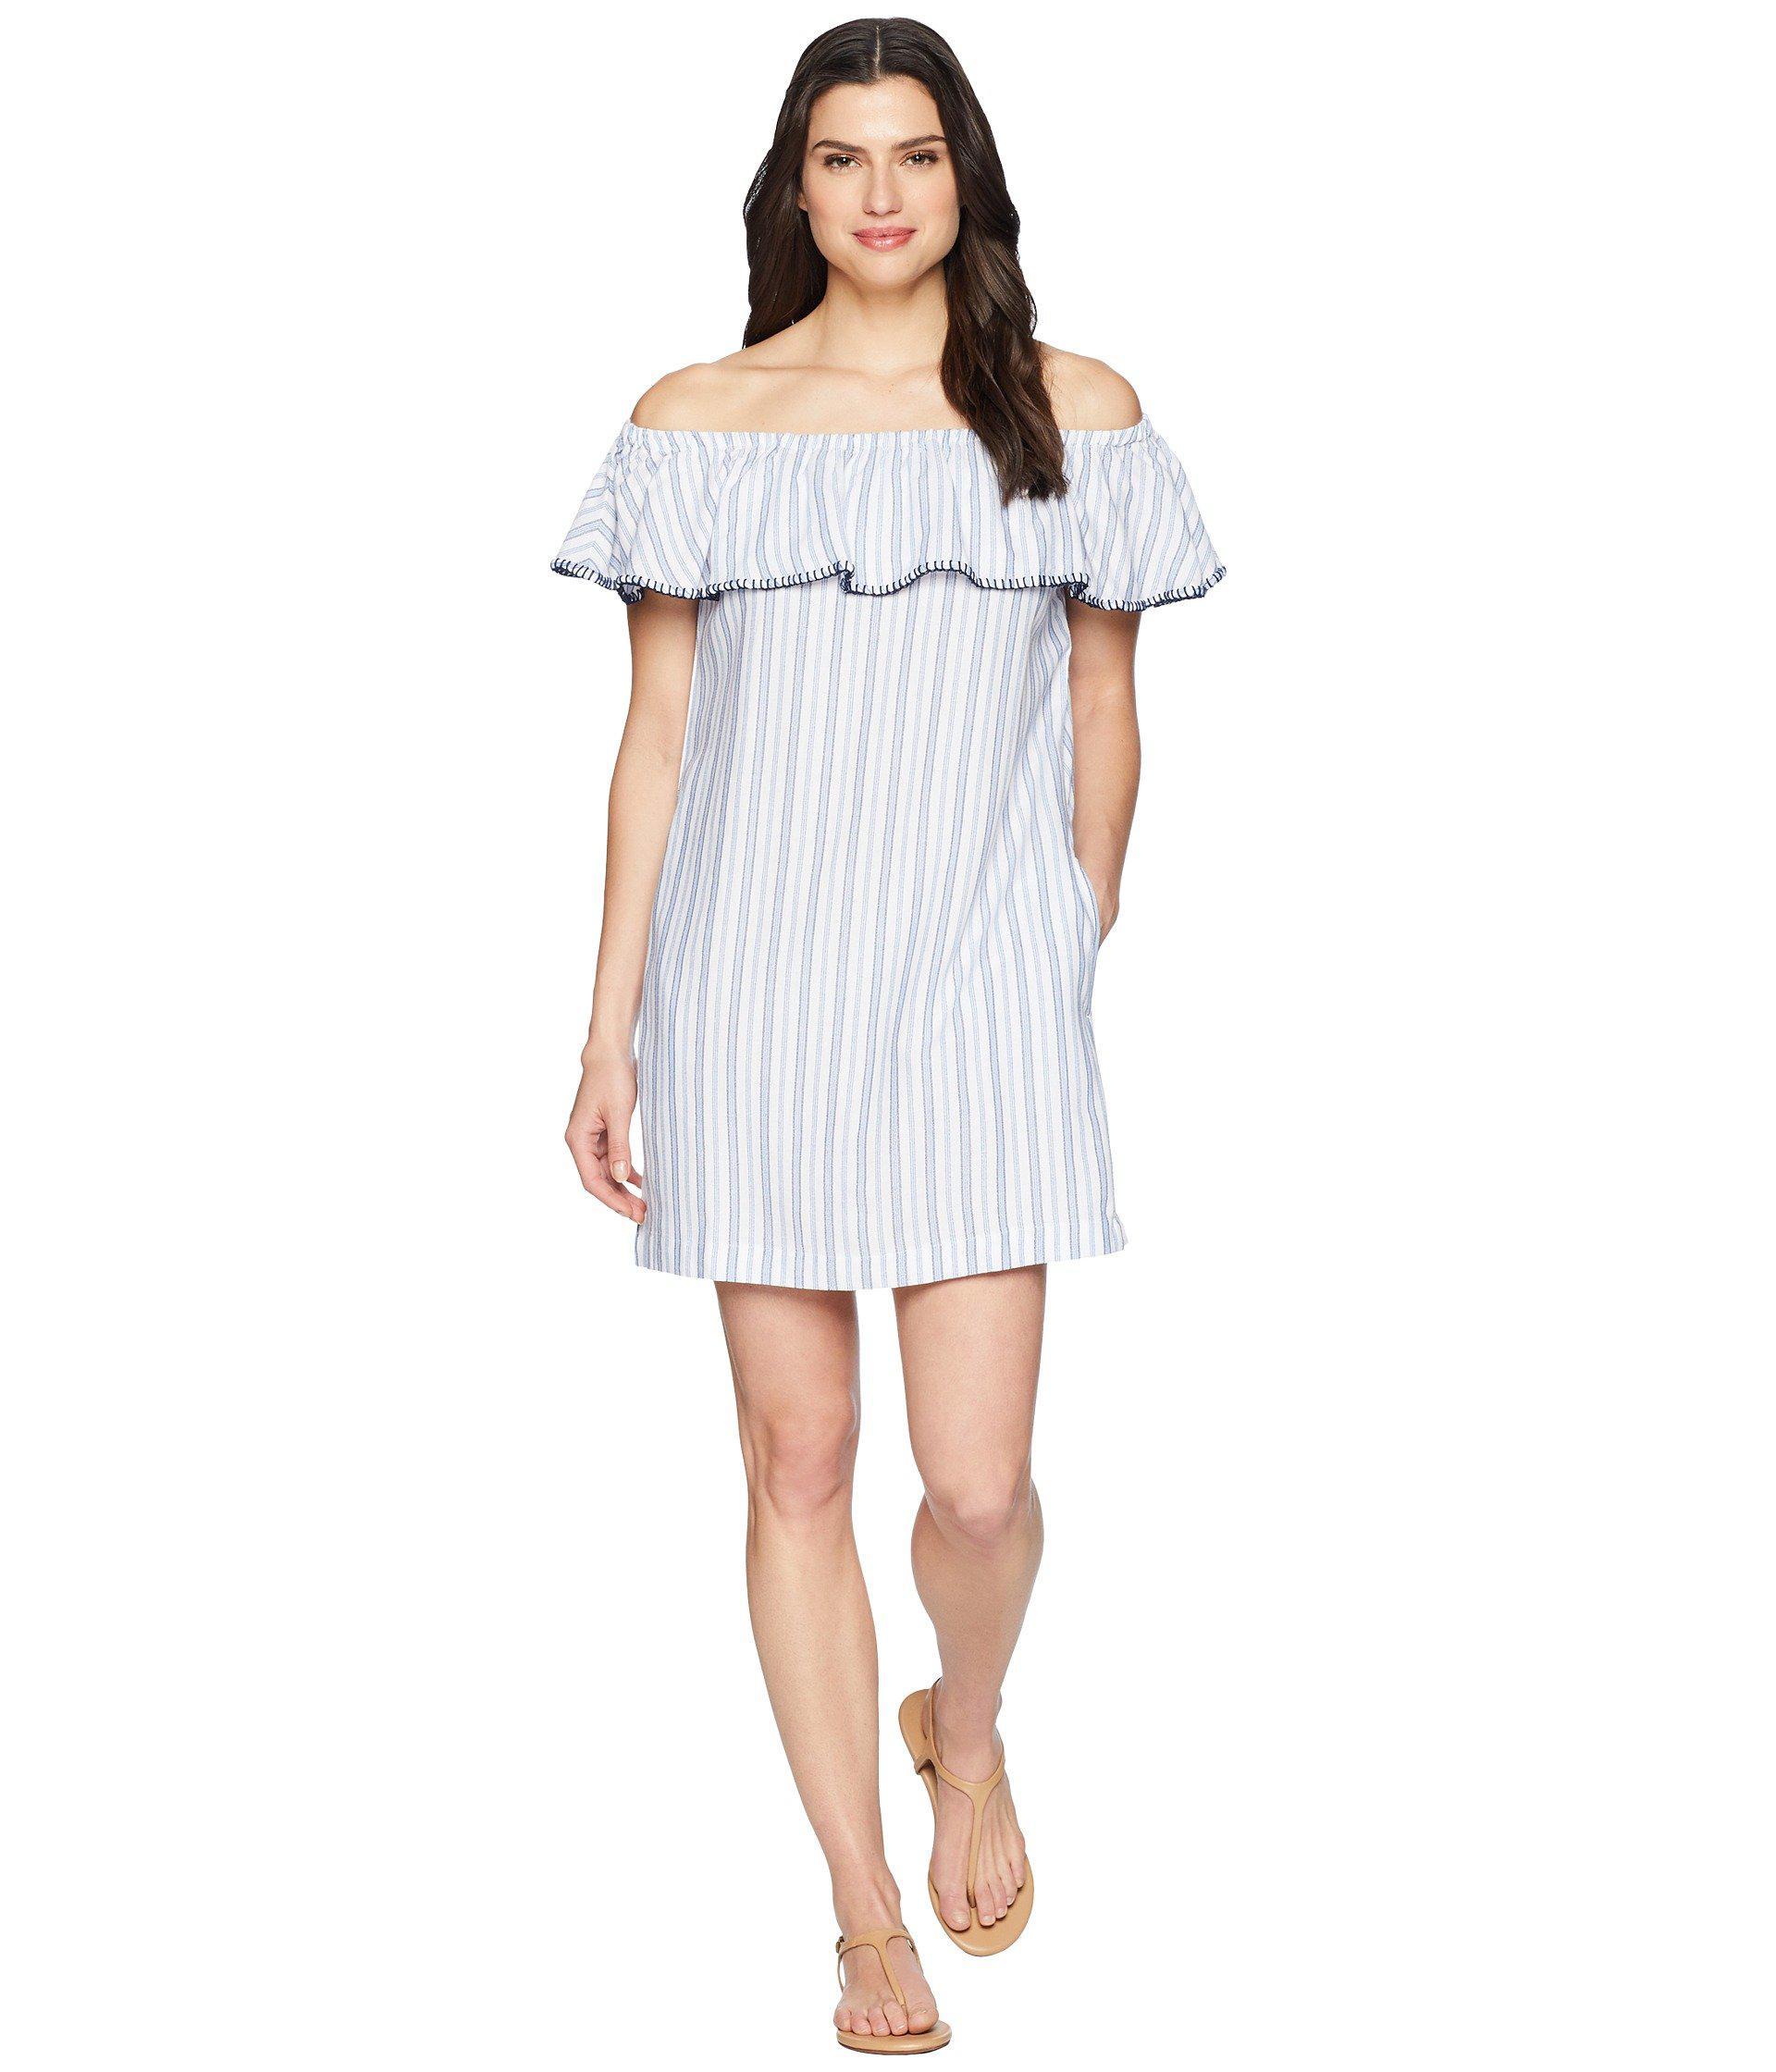 87cfe7e3f5 Tommy Bahama. Women's White Yarn-dye Ticking Off Shoulder Ruffle Dress Cover -up